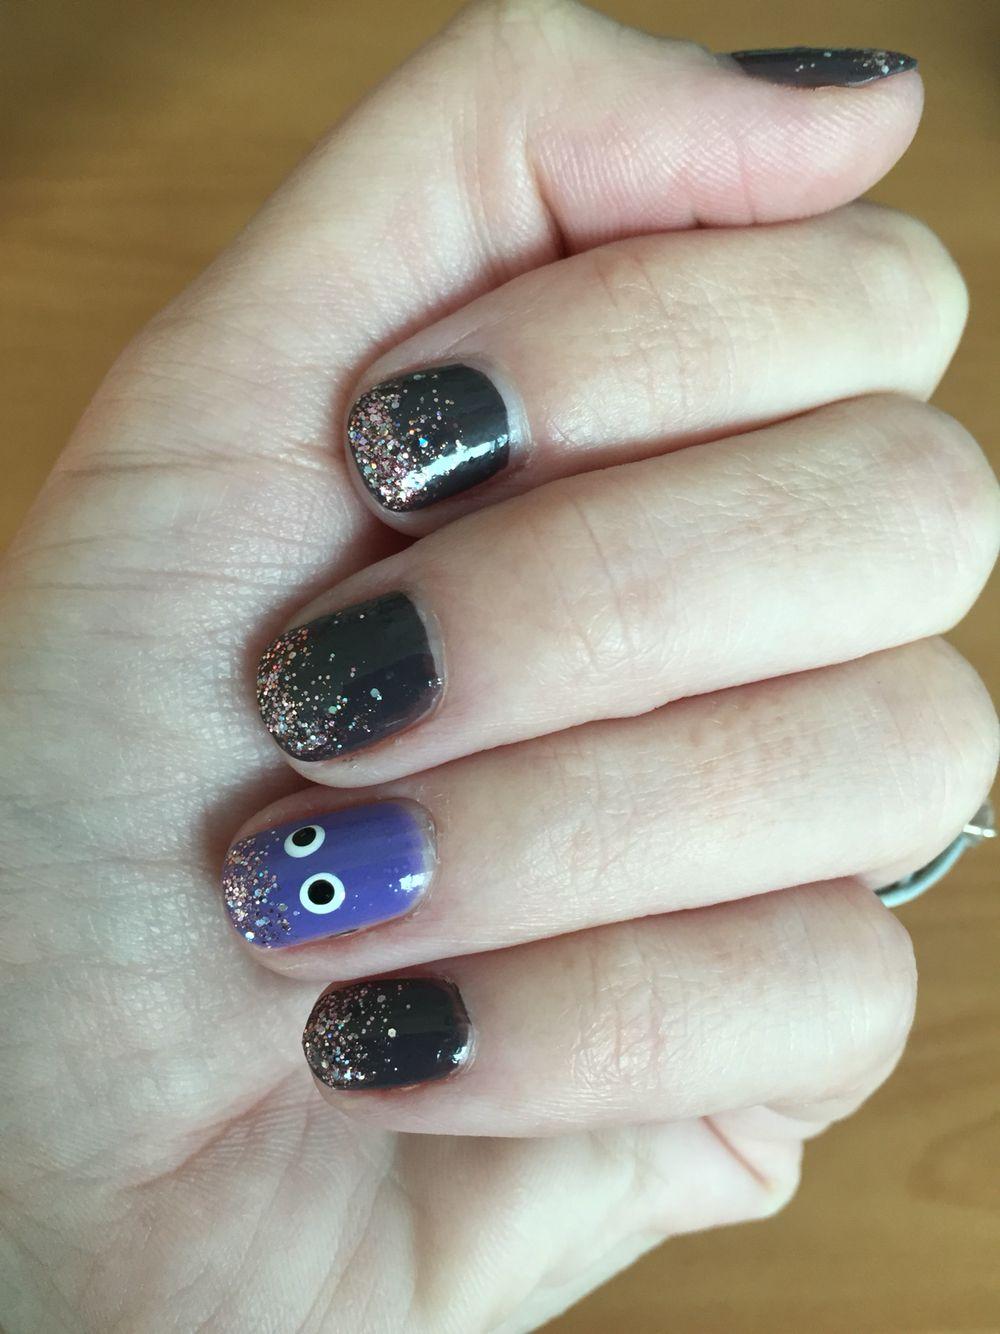 Subtle Halloween nails | Halloween nails, Nails, Halloween